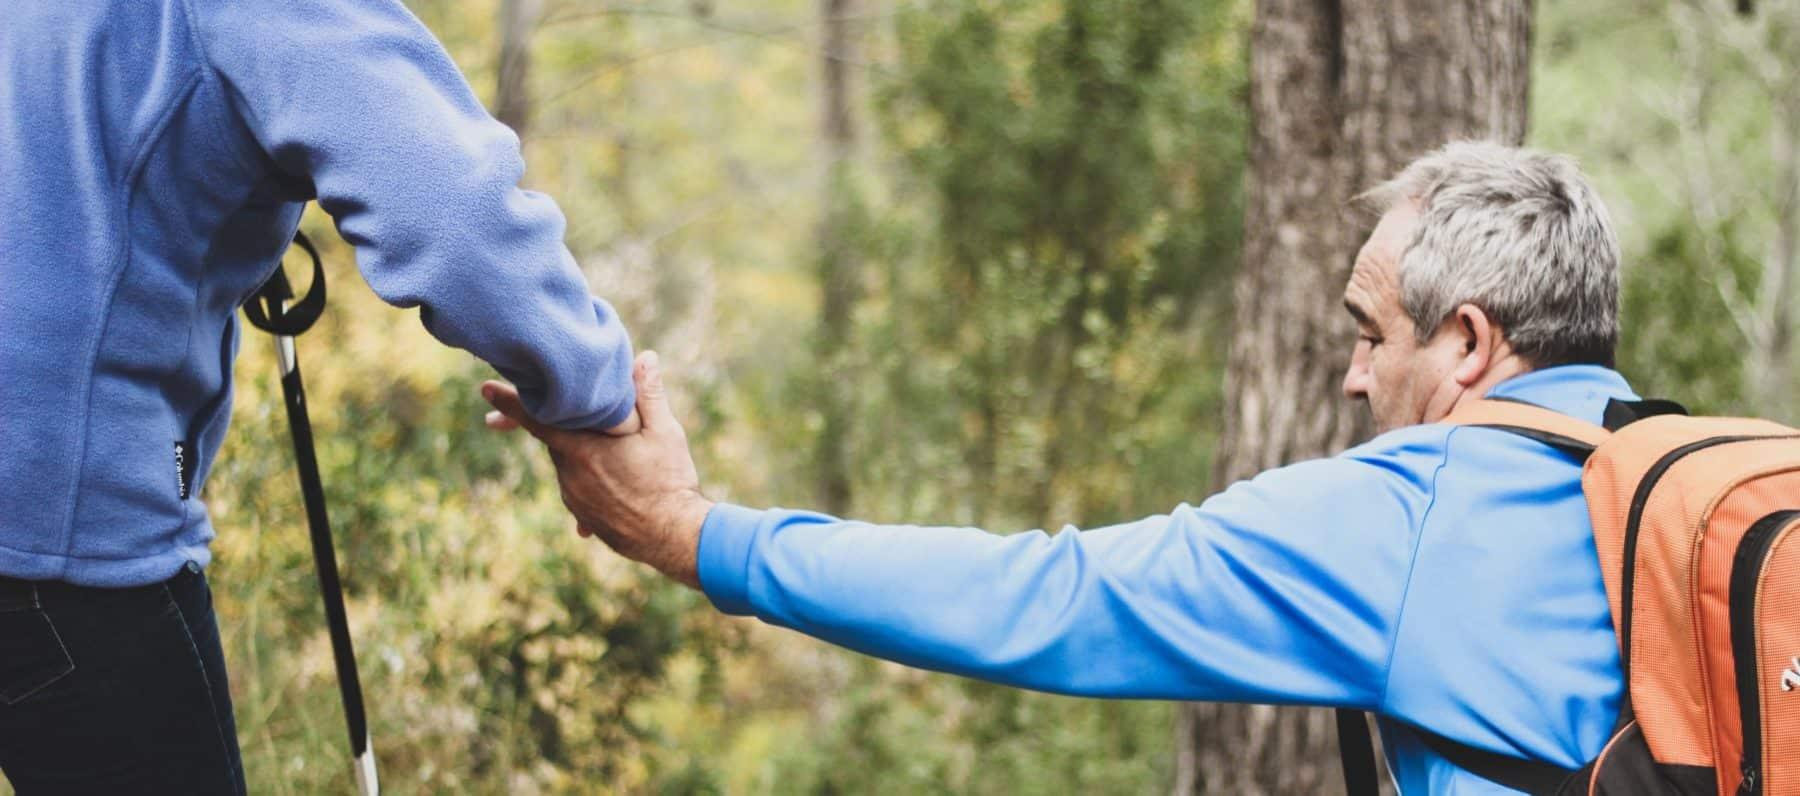 NDIS Social Activities - couple hiking